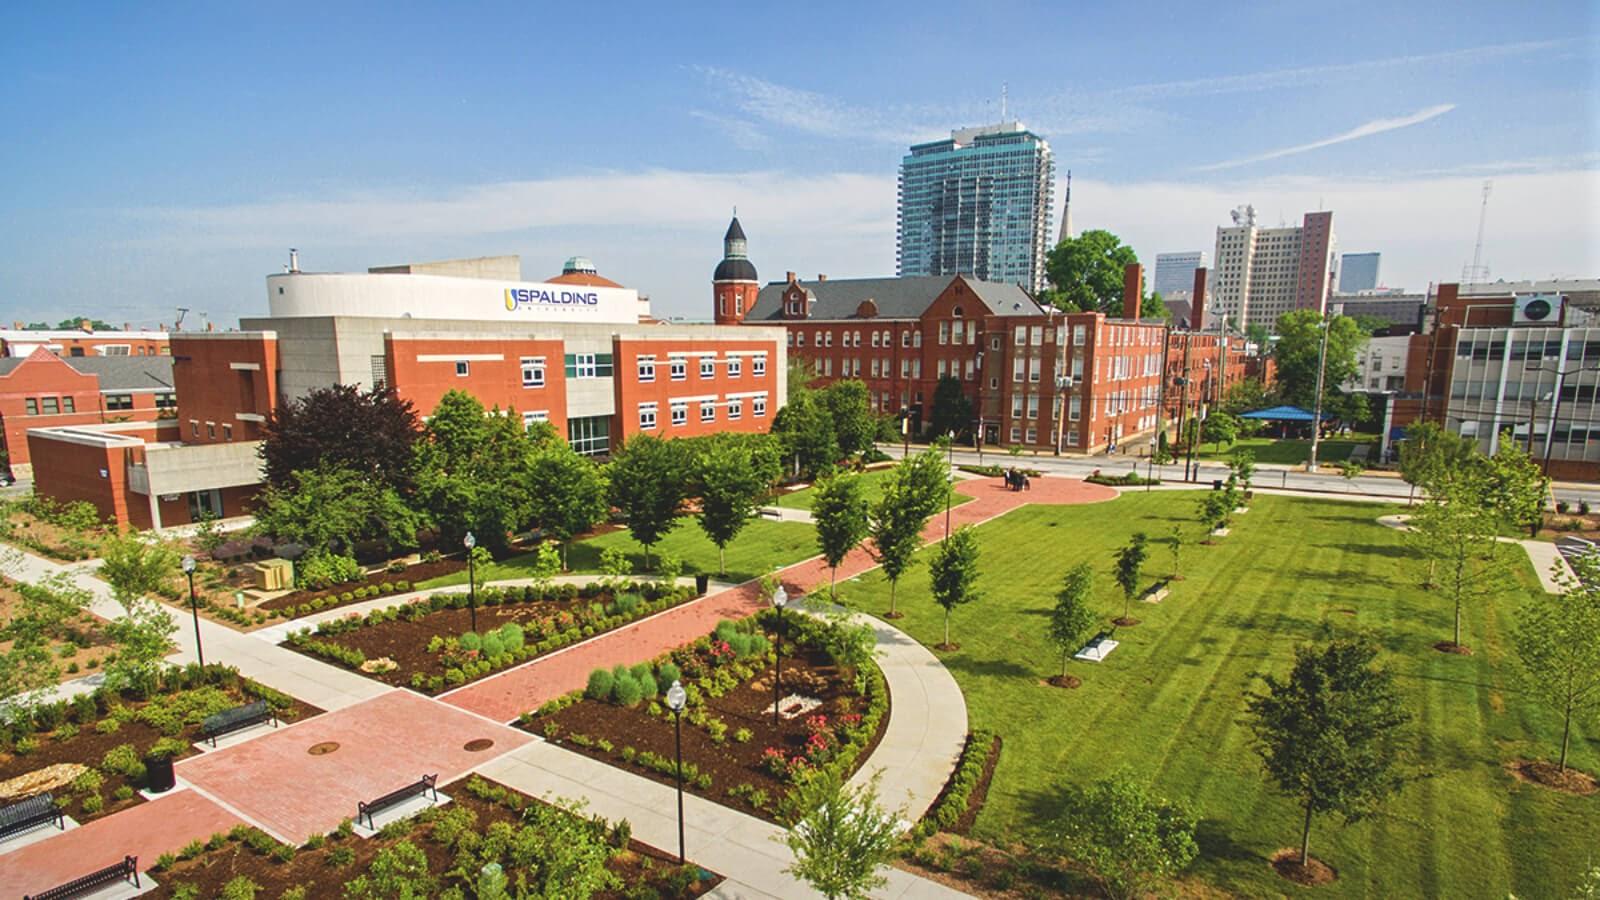 spalding-university-campus